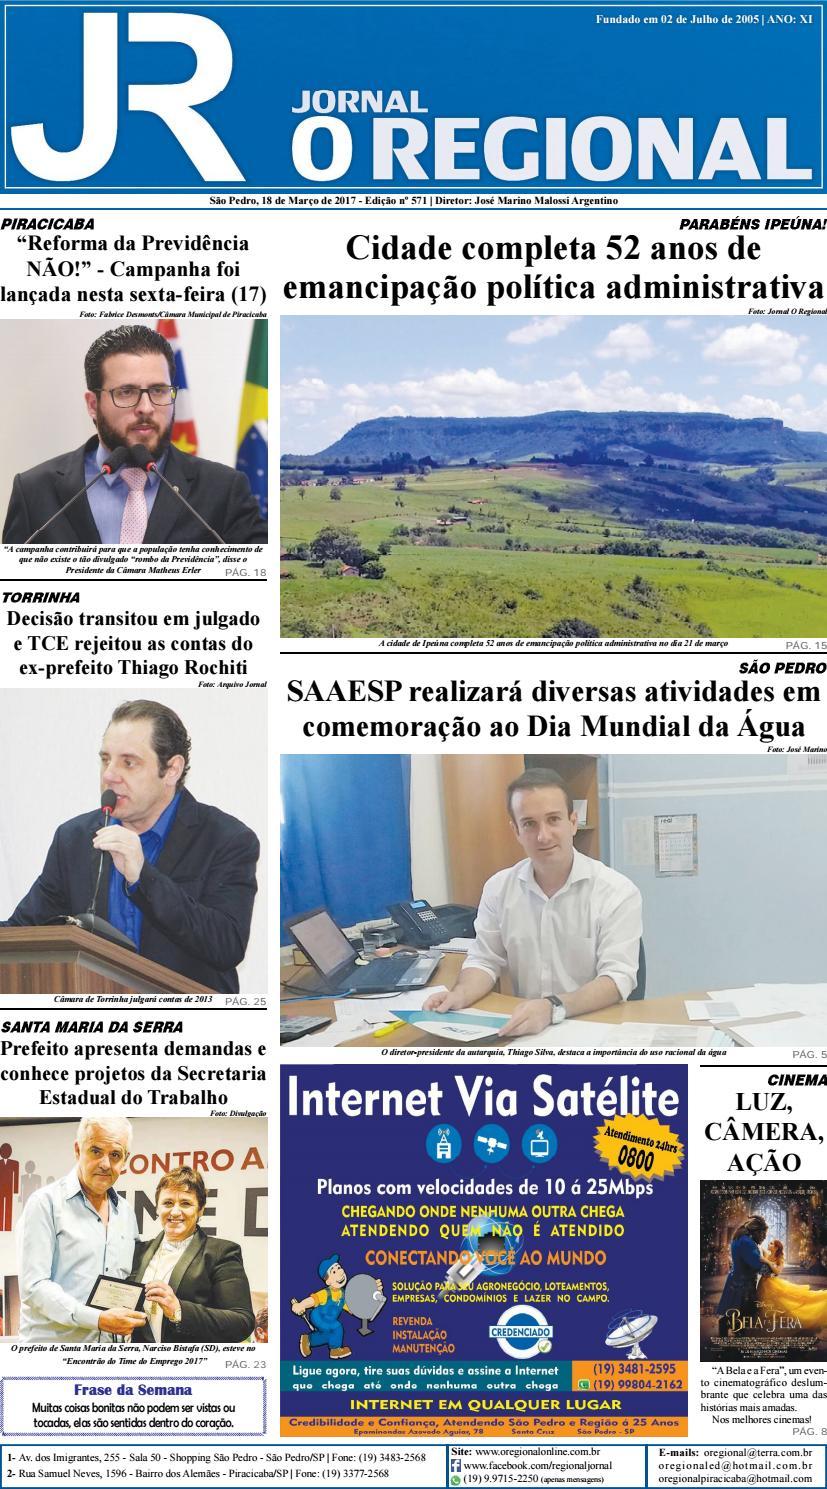 b8834c850 Jornal o regional edição 571 18 03 2017 site by Jornal O Regional - issuu